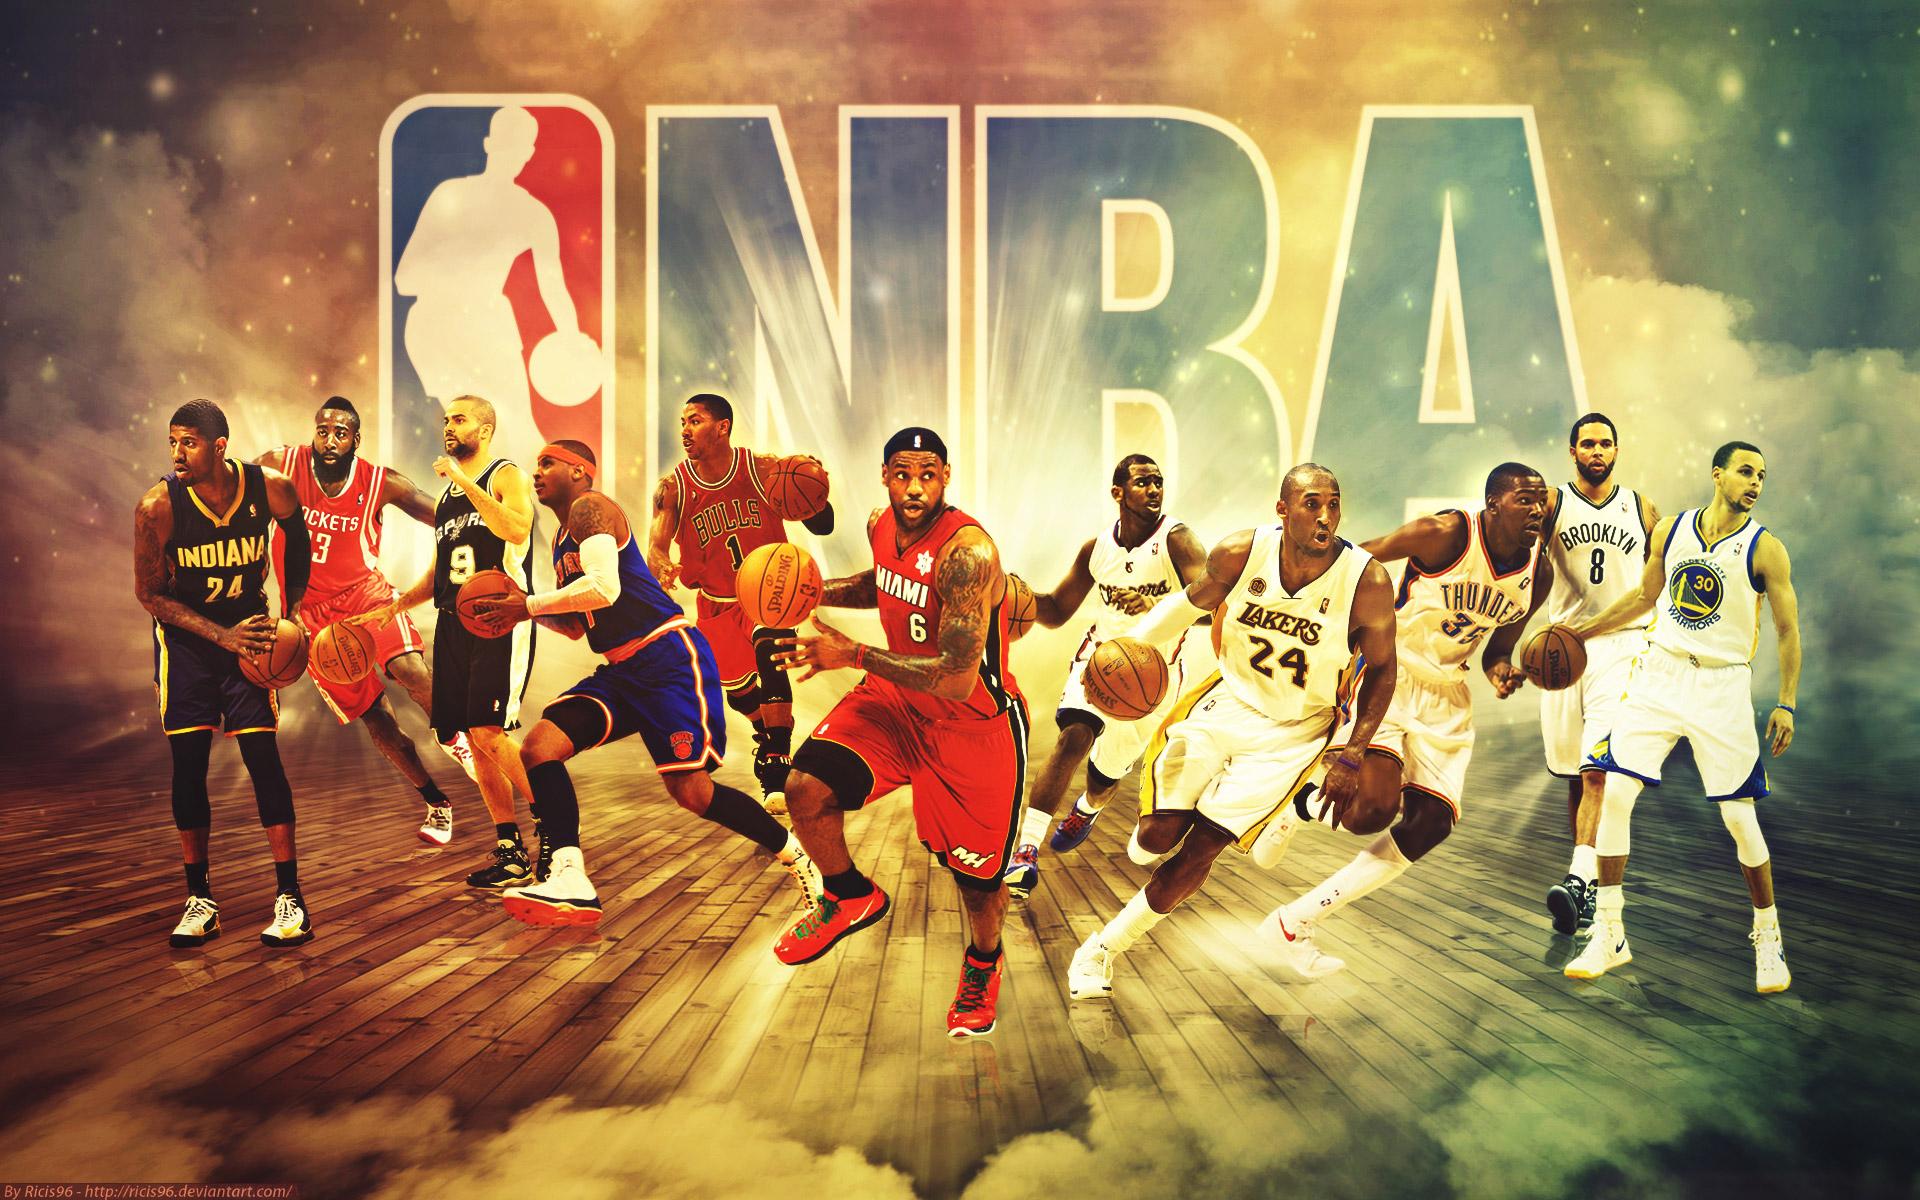 НБА. Орландо победил Хьюстон. Поединки 24-го декабря